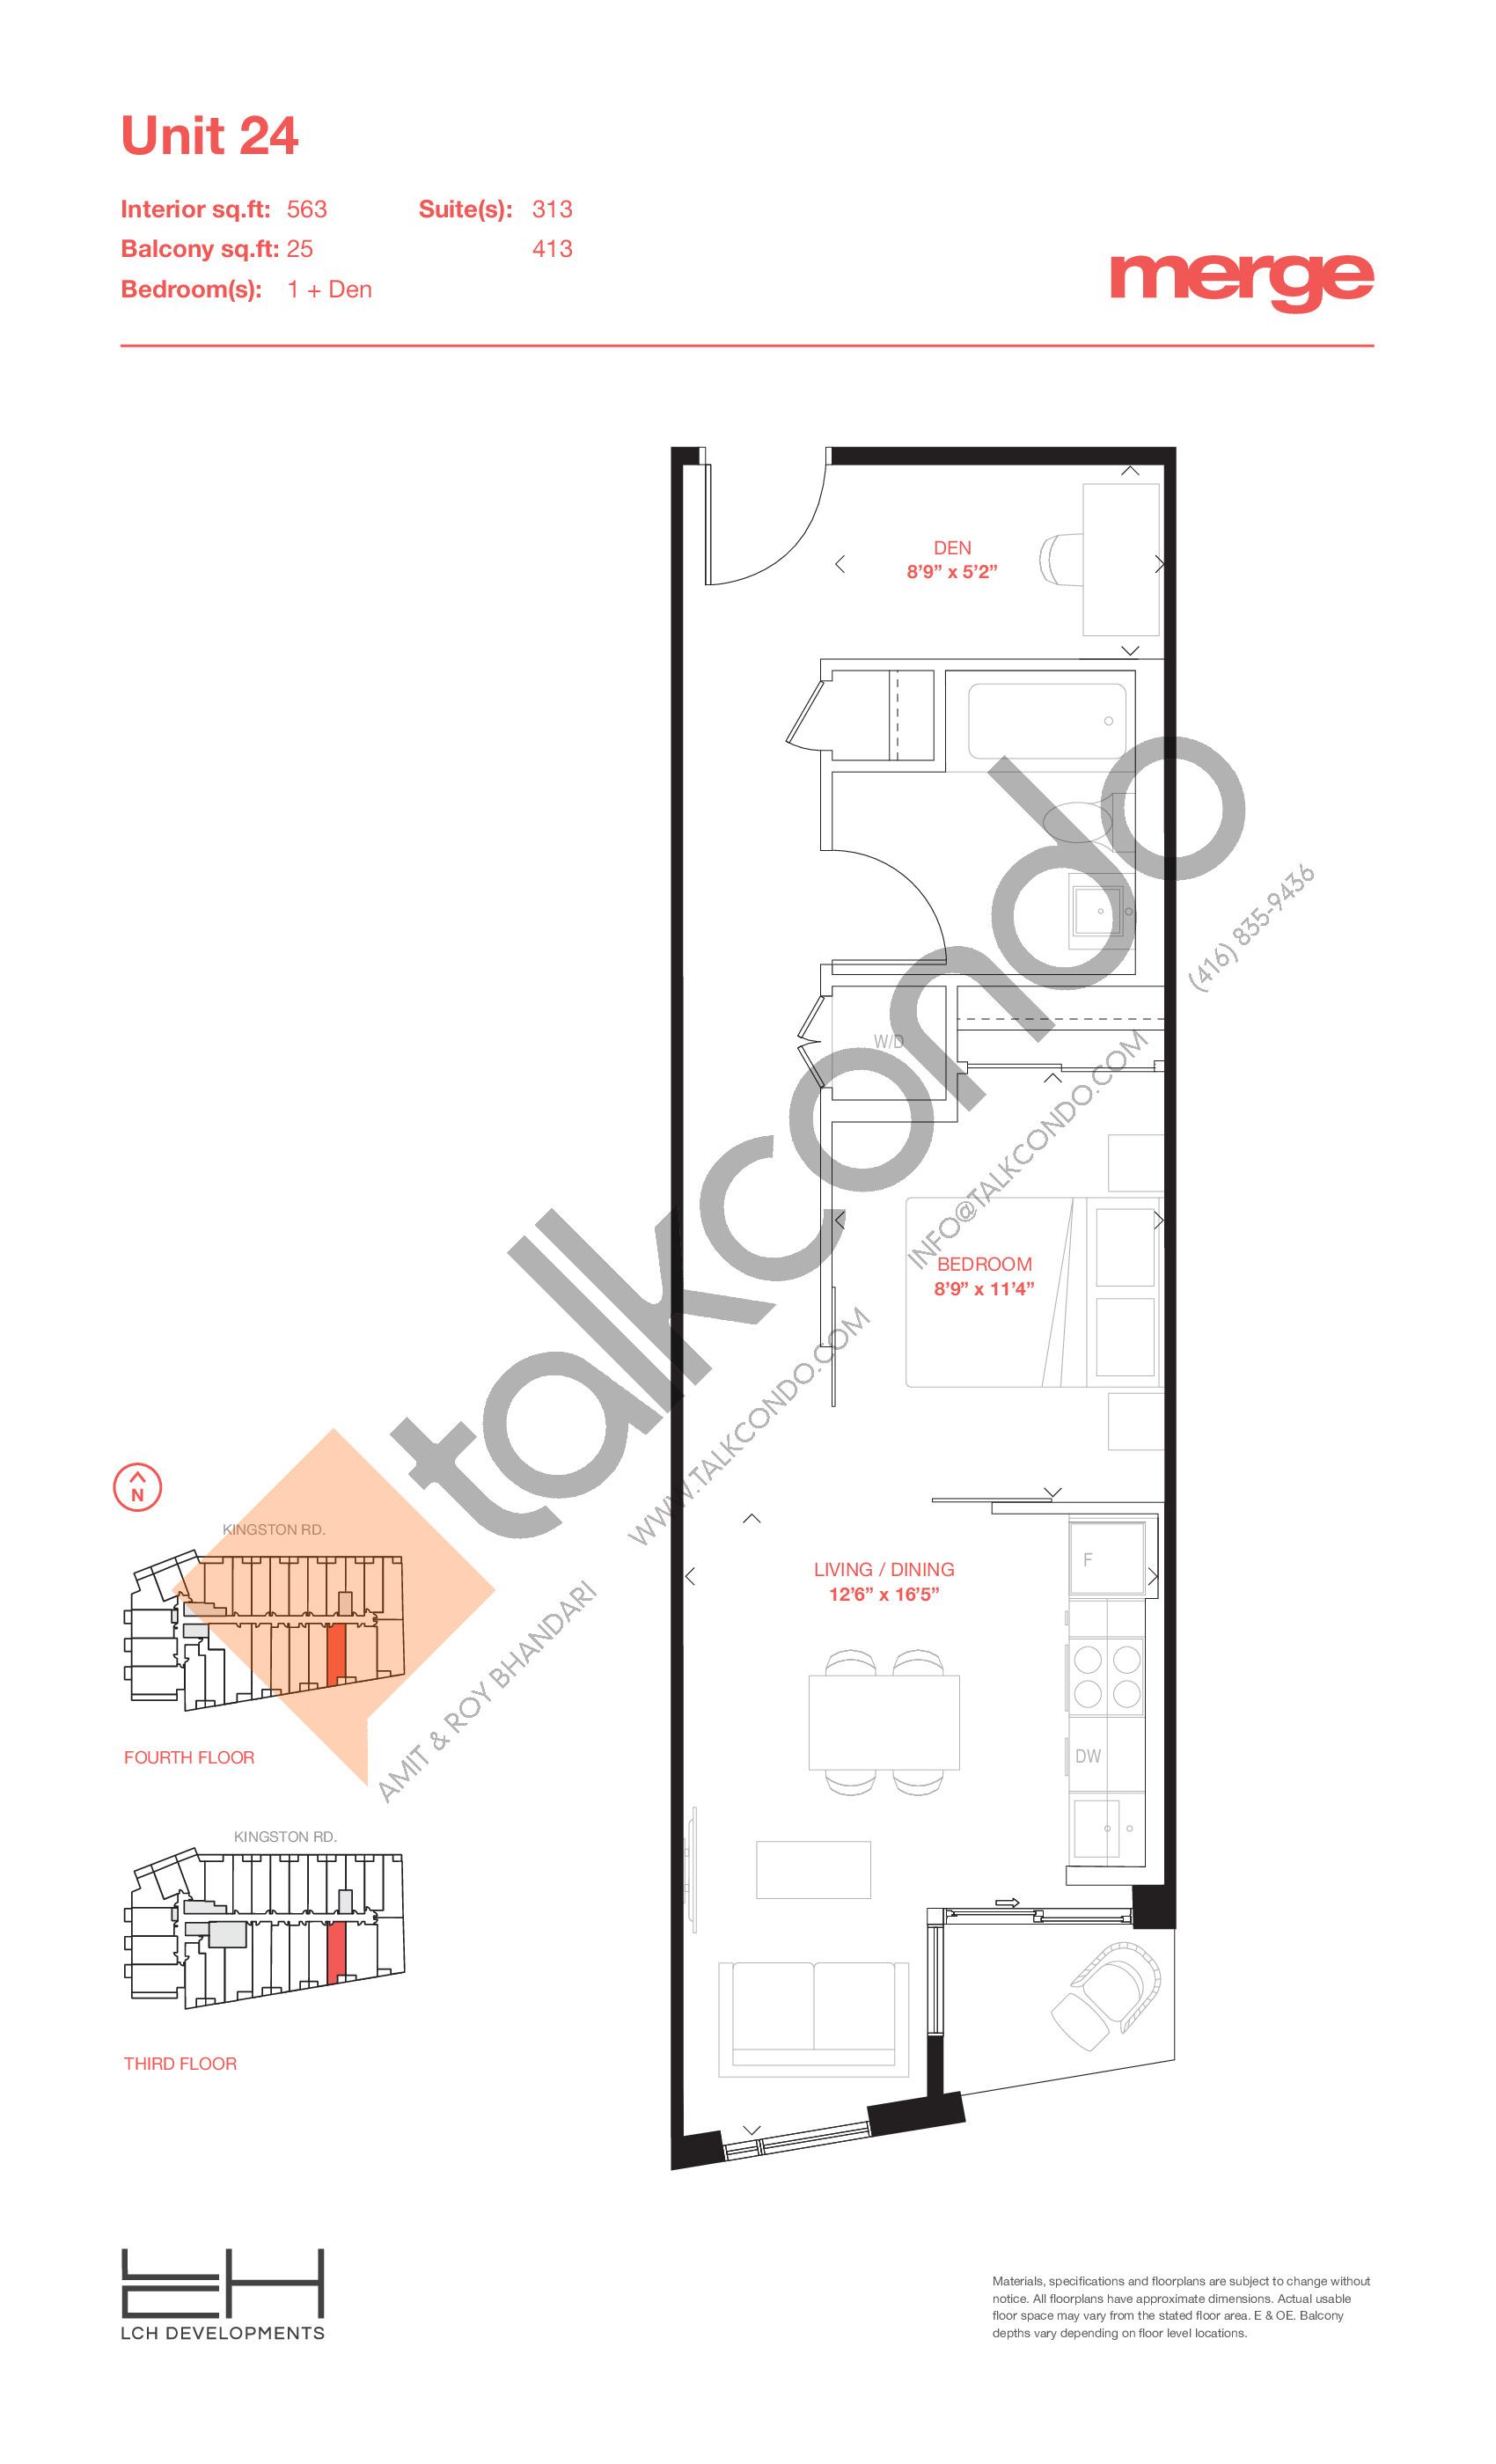 Unit 24 - Tower Floor Plan at Merge Condos - 563 sq.ft